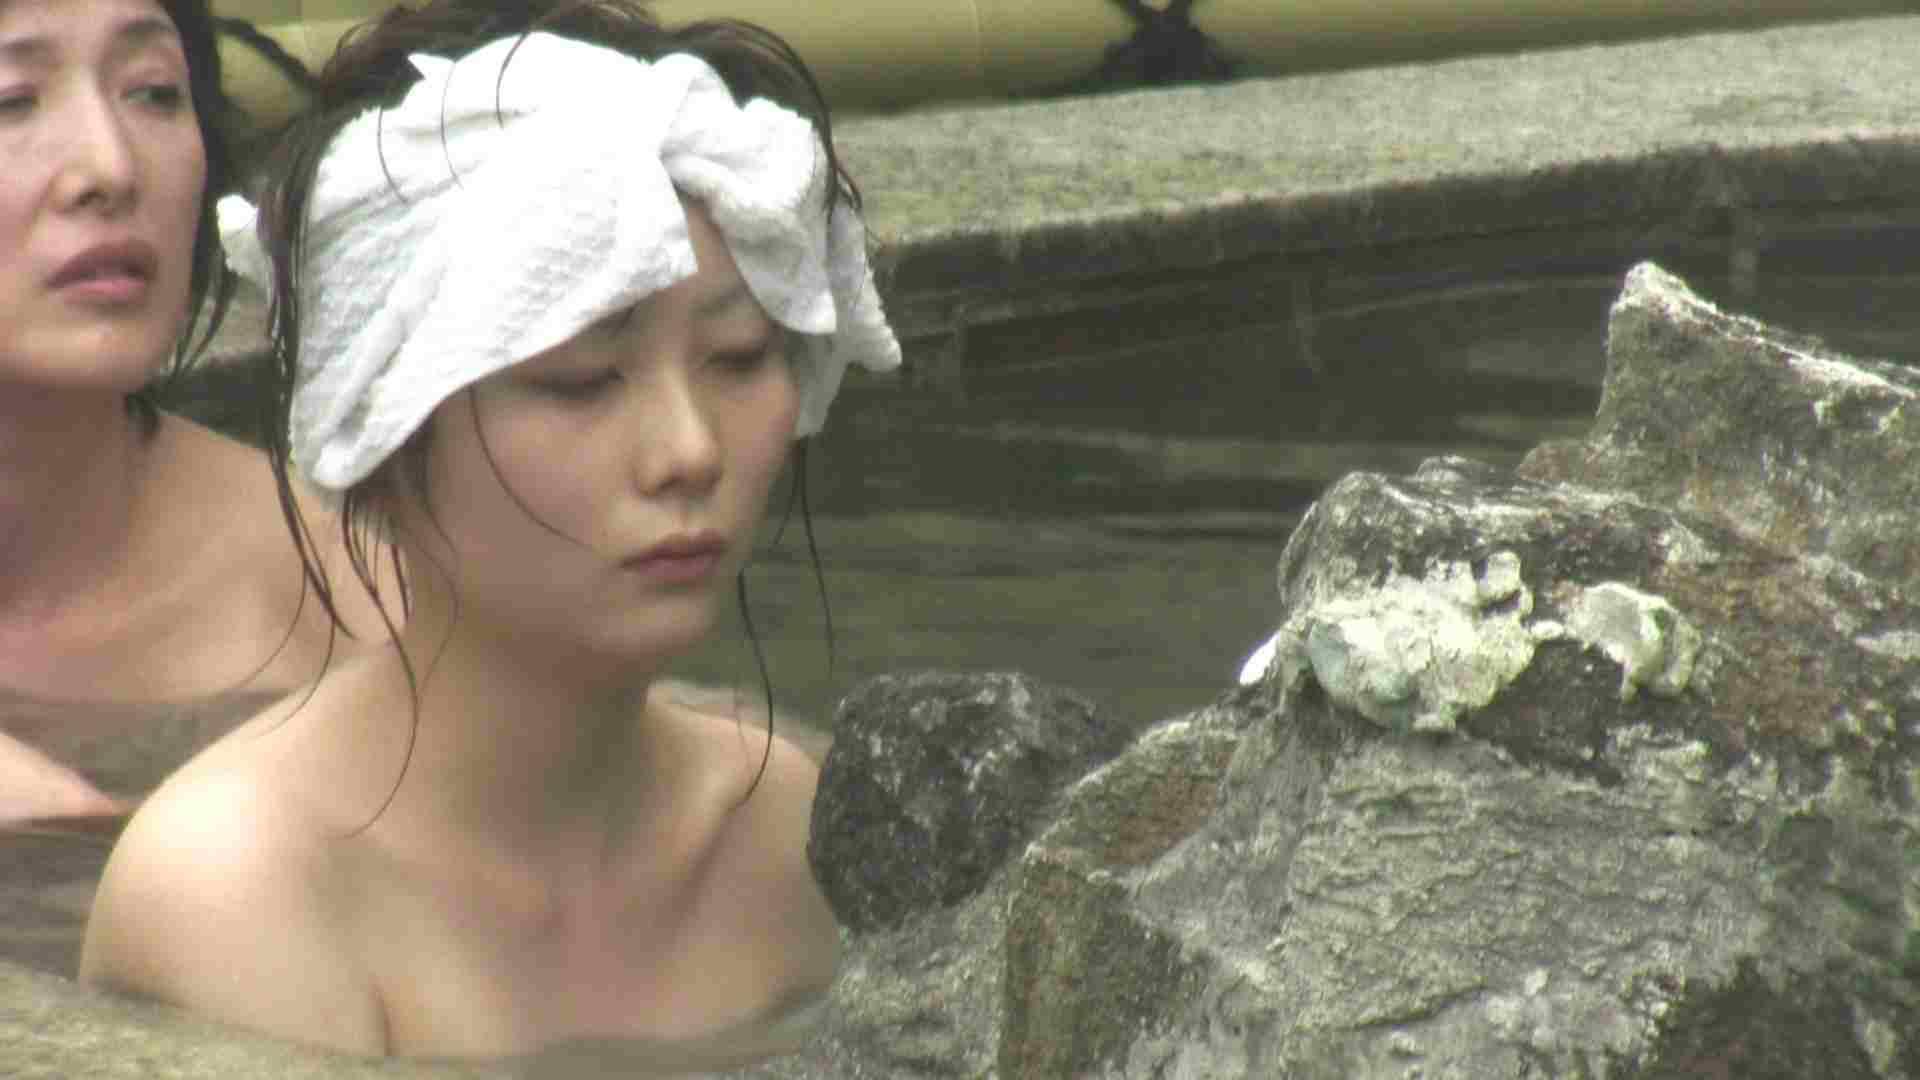 Aquaな露天風呂Vol.147 綺麗なOLたち アダルト動画キャプチャ 102枚 26